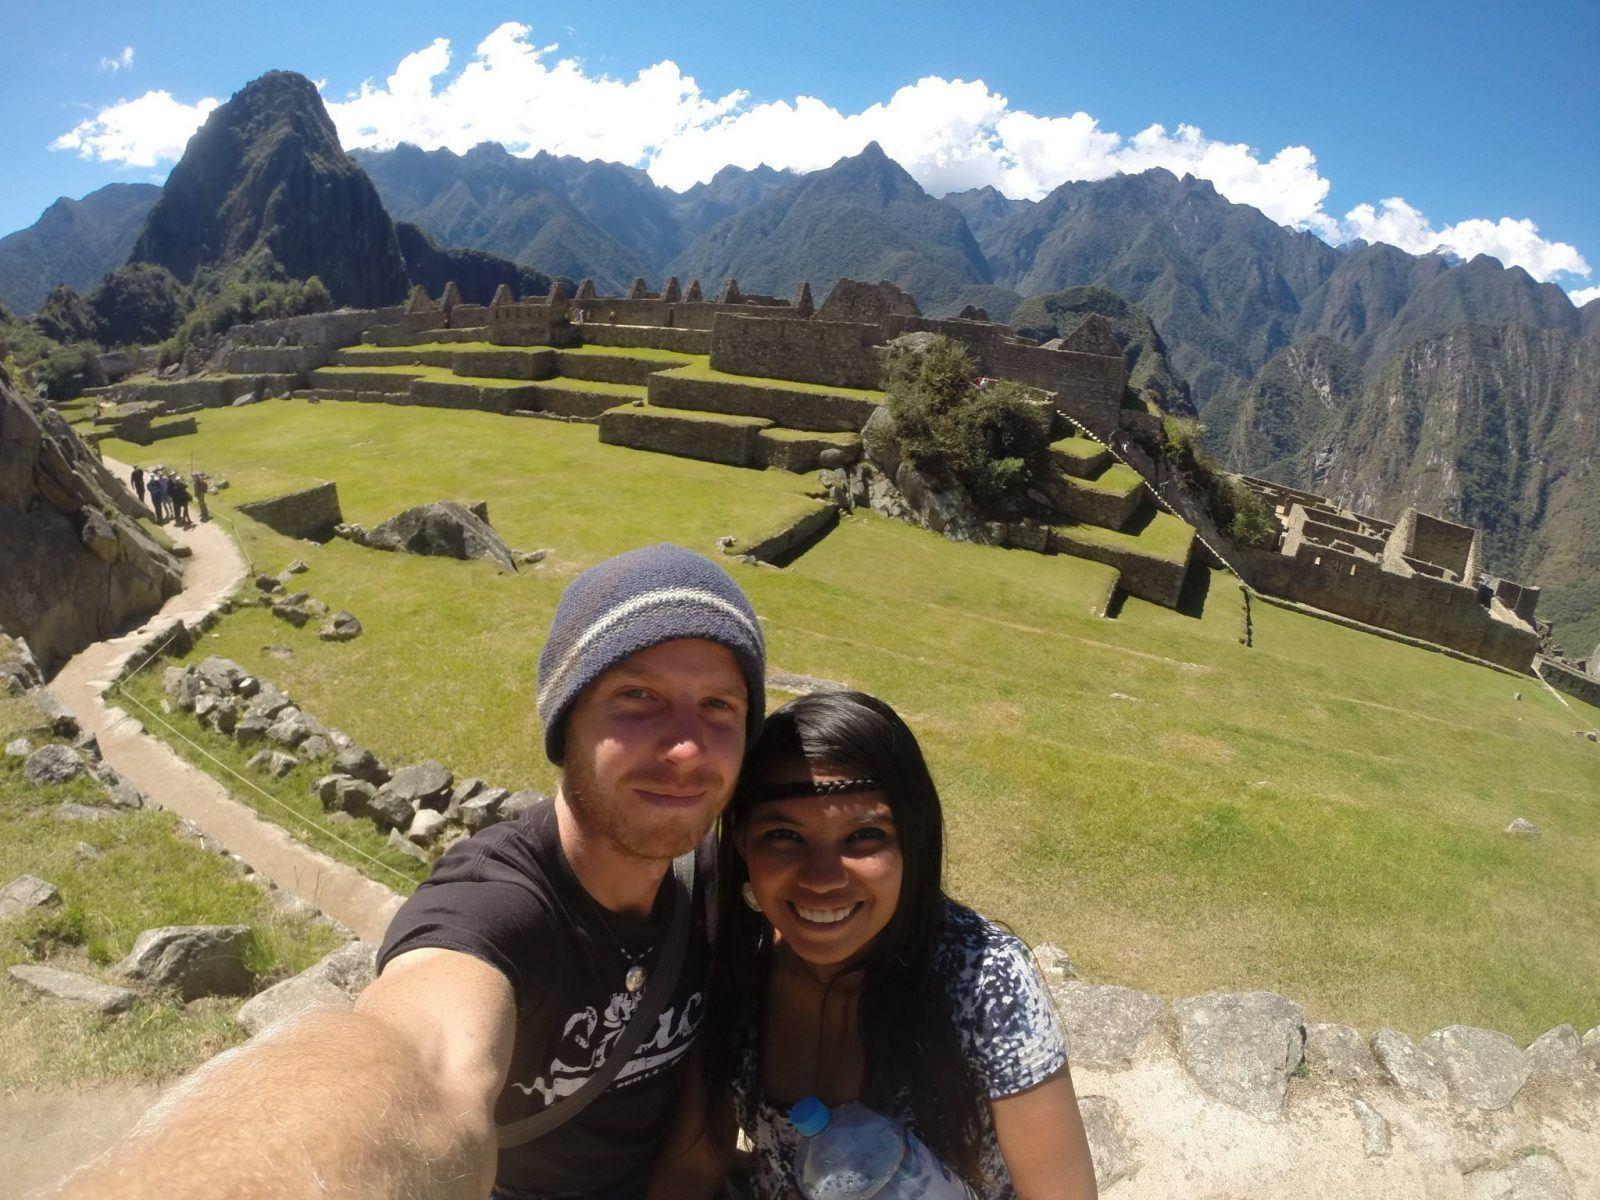 sustainable travel lifestyle - Filipina Backpacker in Machu Picchu